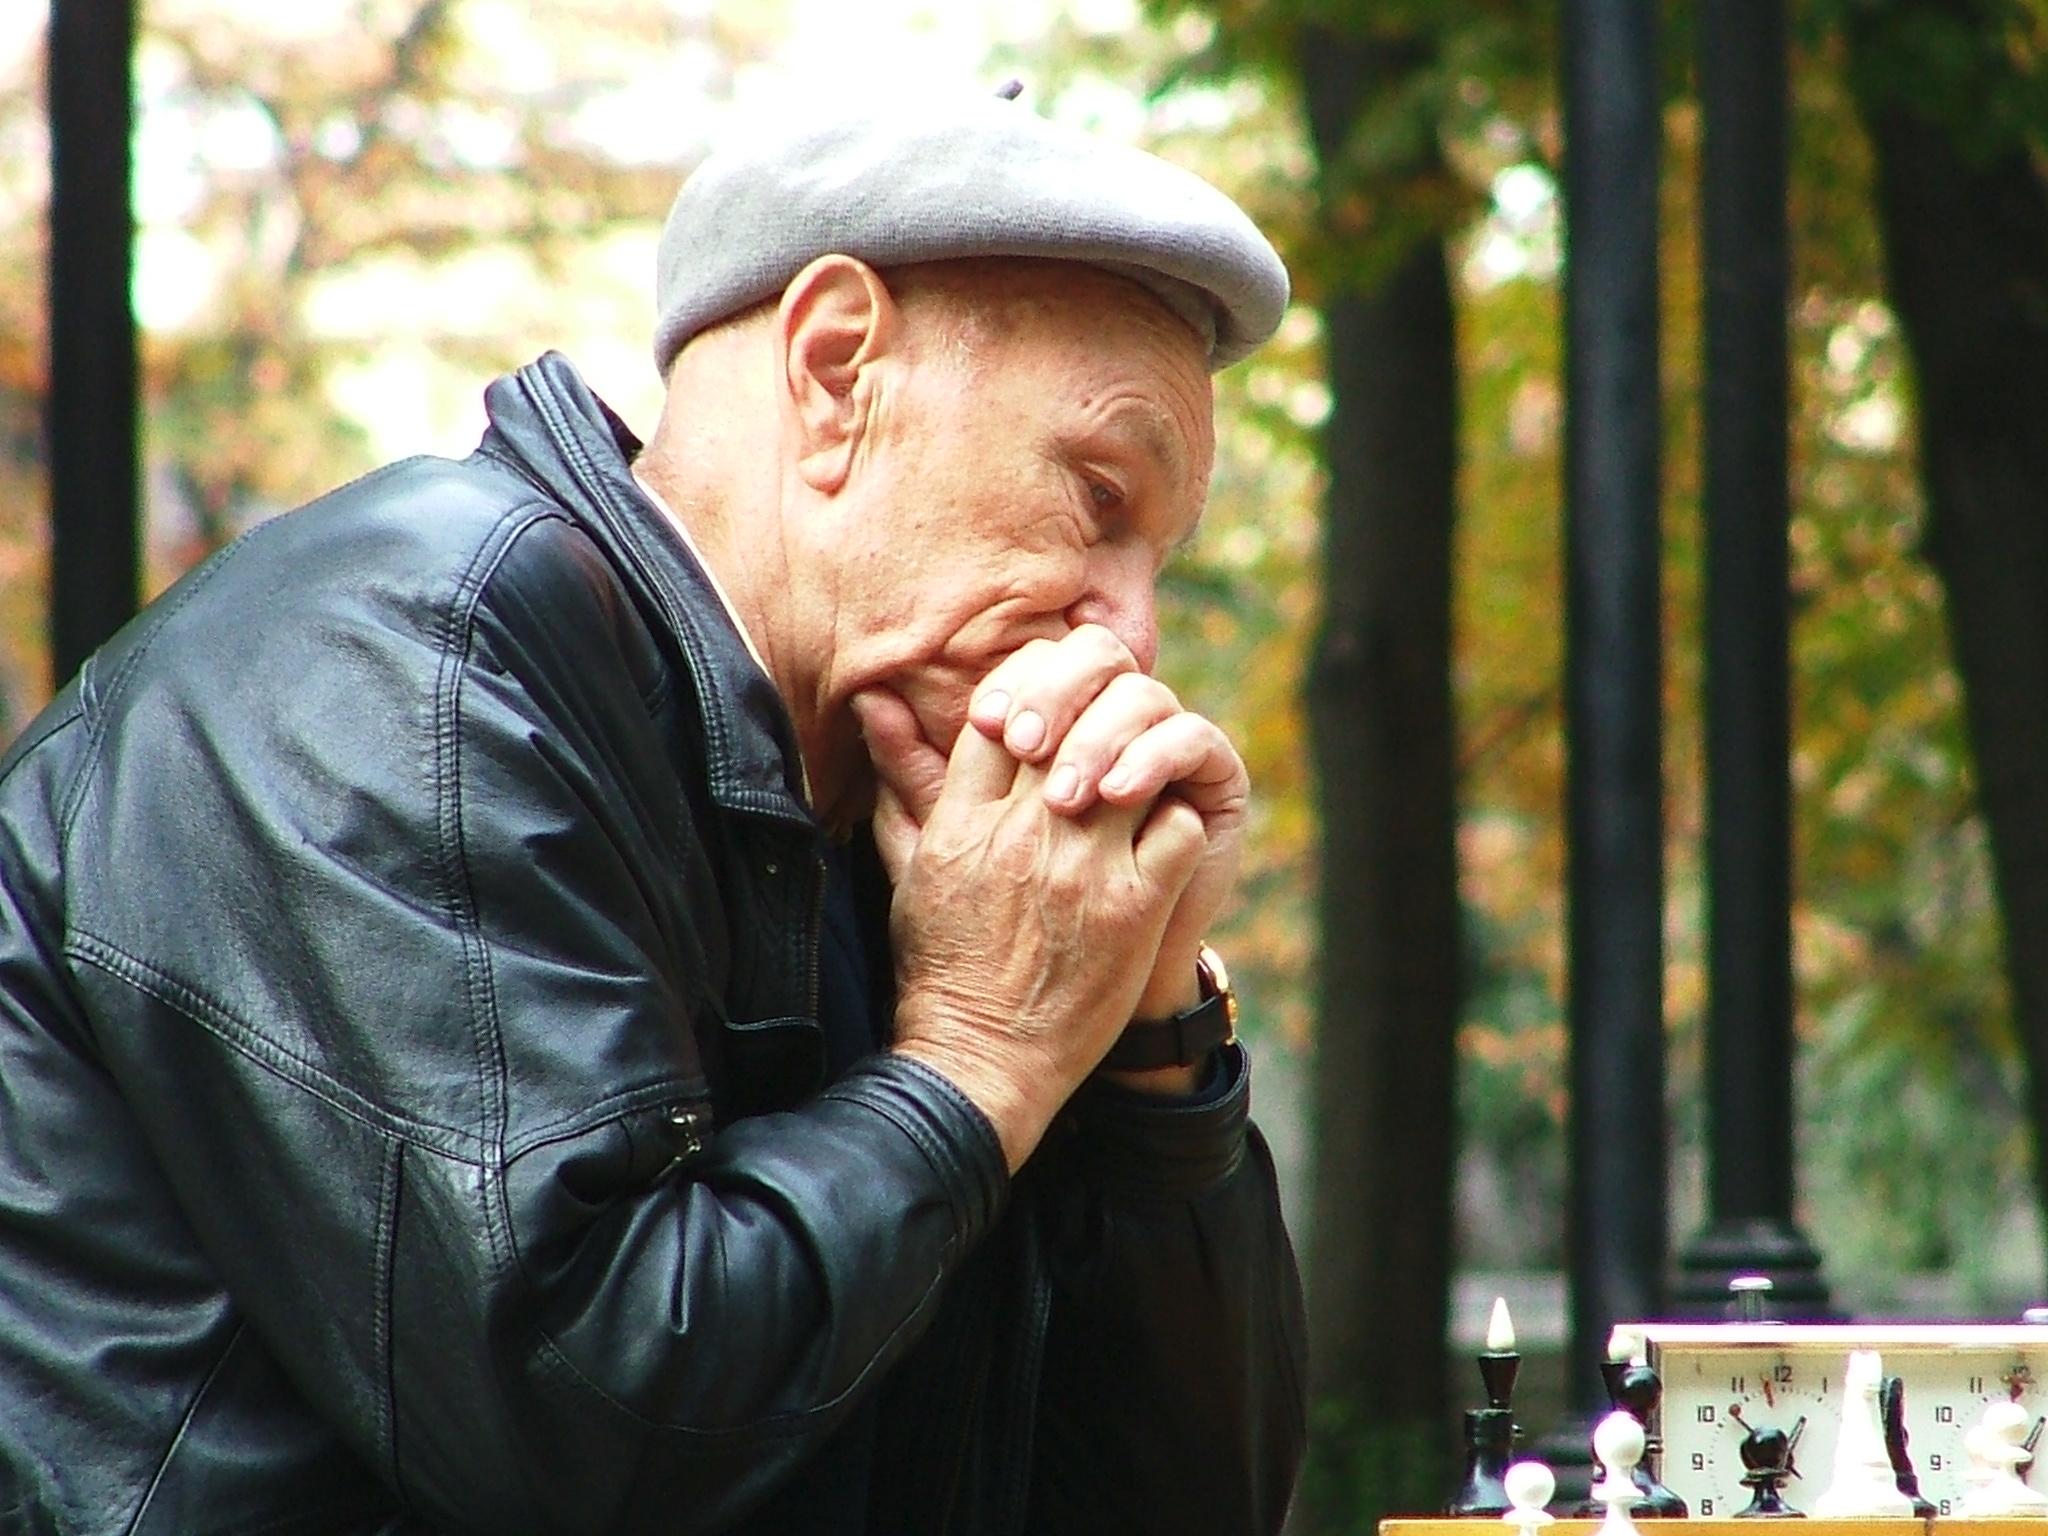 old-chessman-1313916